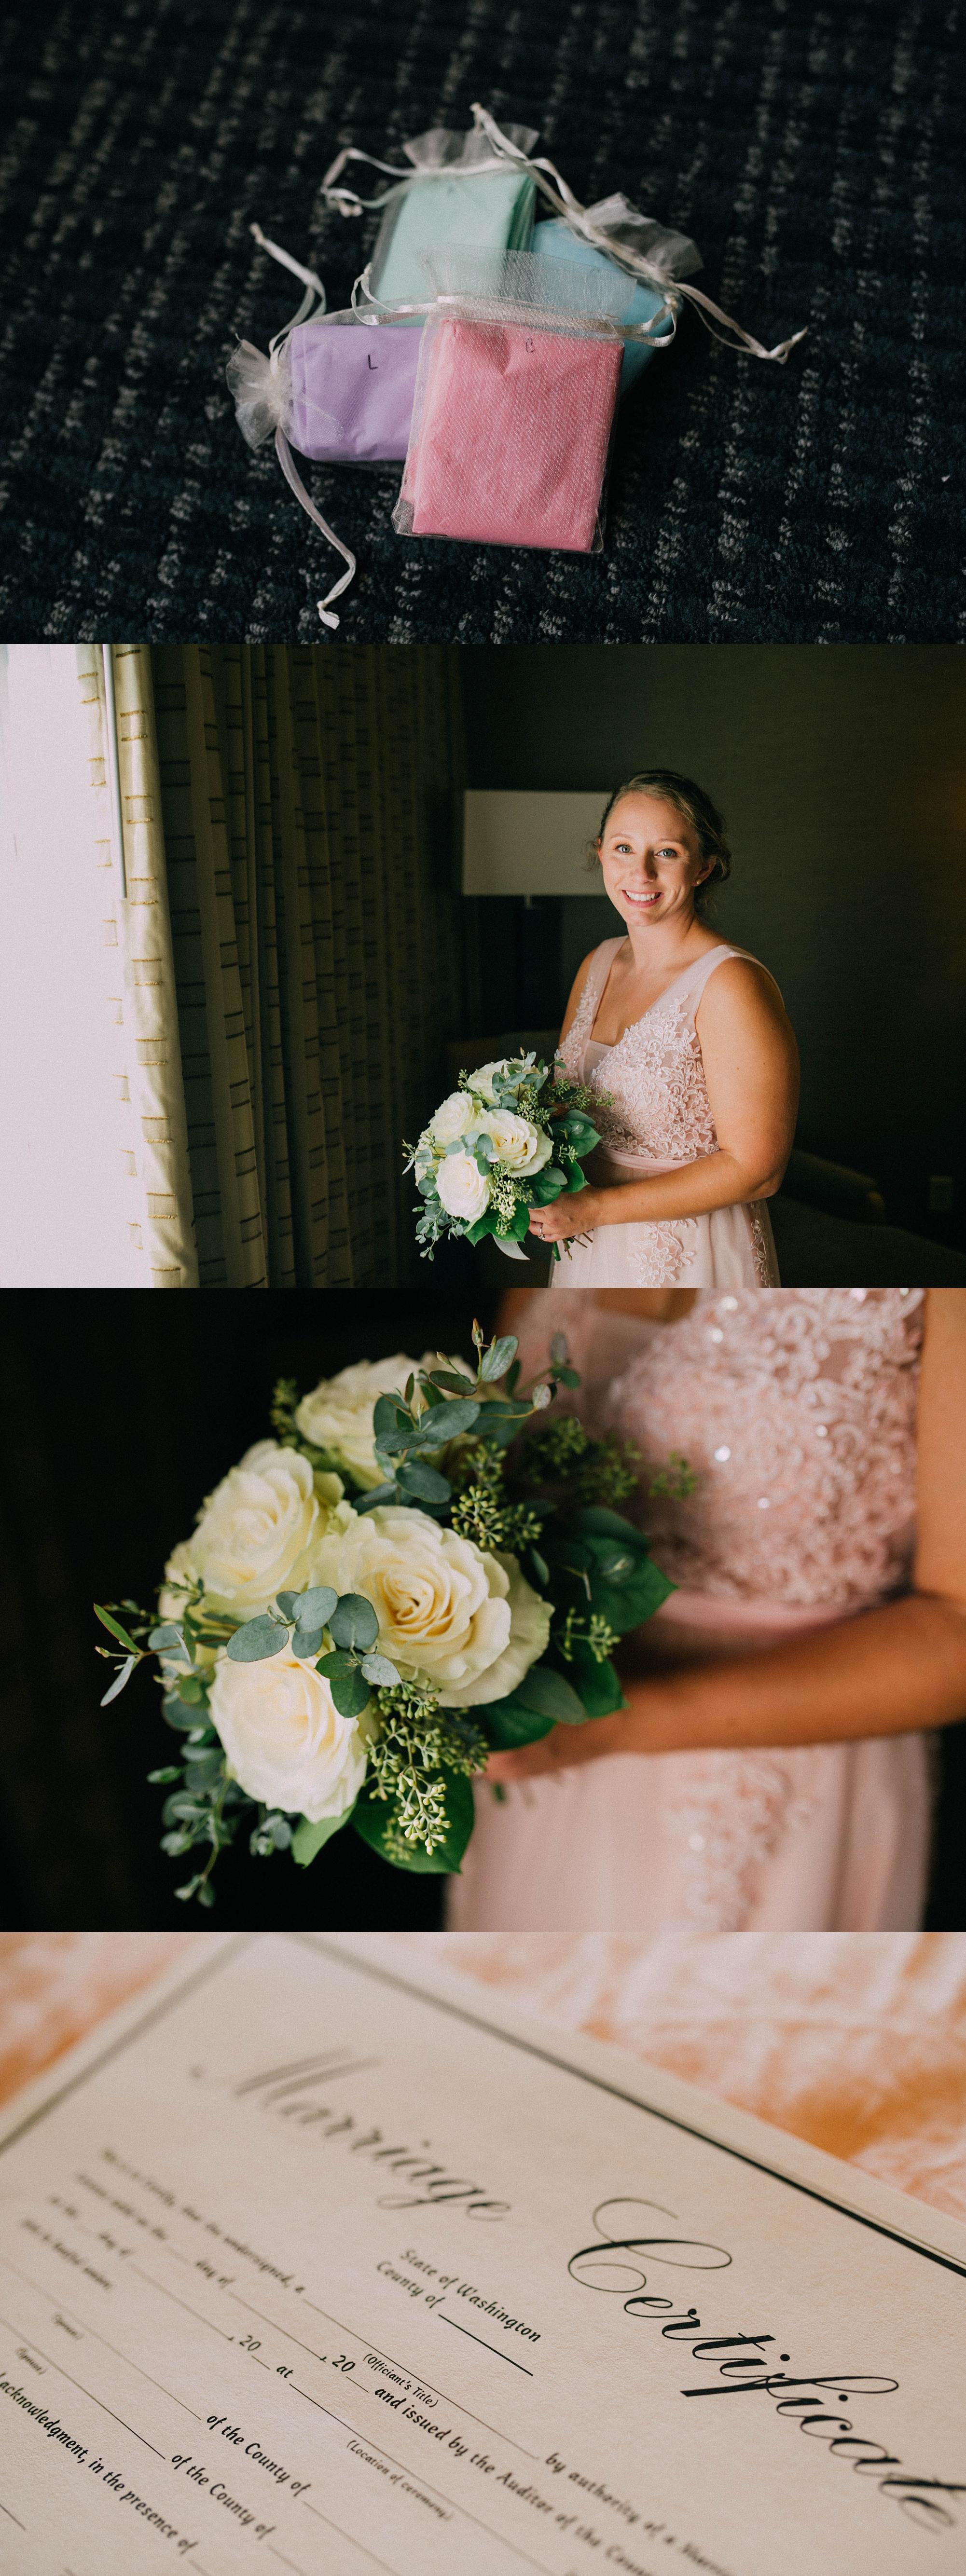 ashley_vos_seattle_ wedding_photographer_0480.jpg